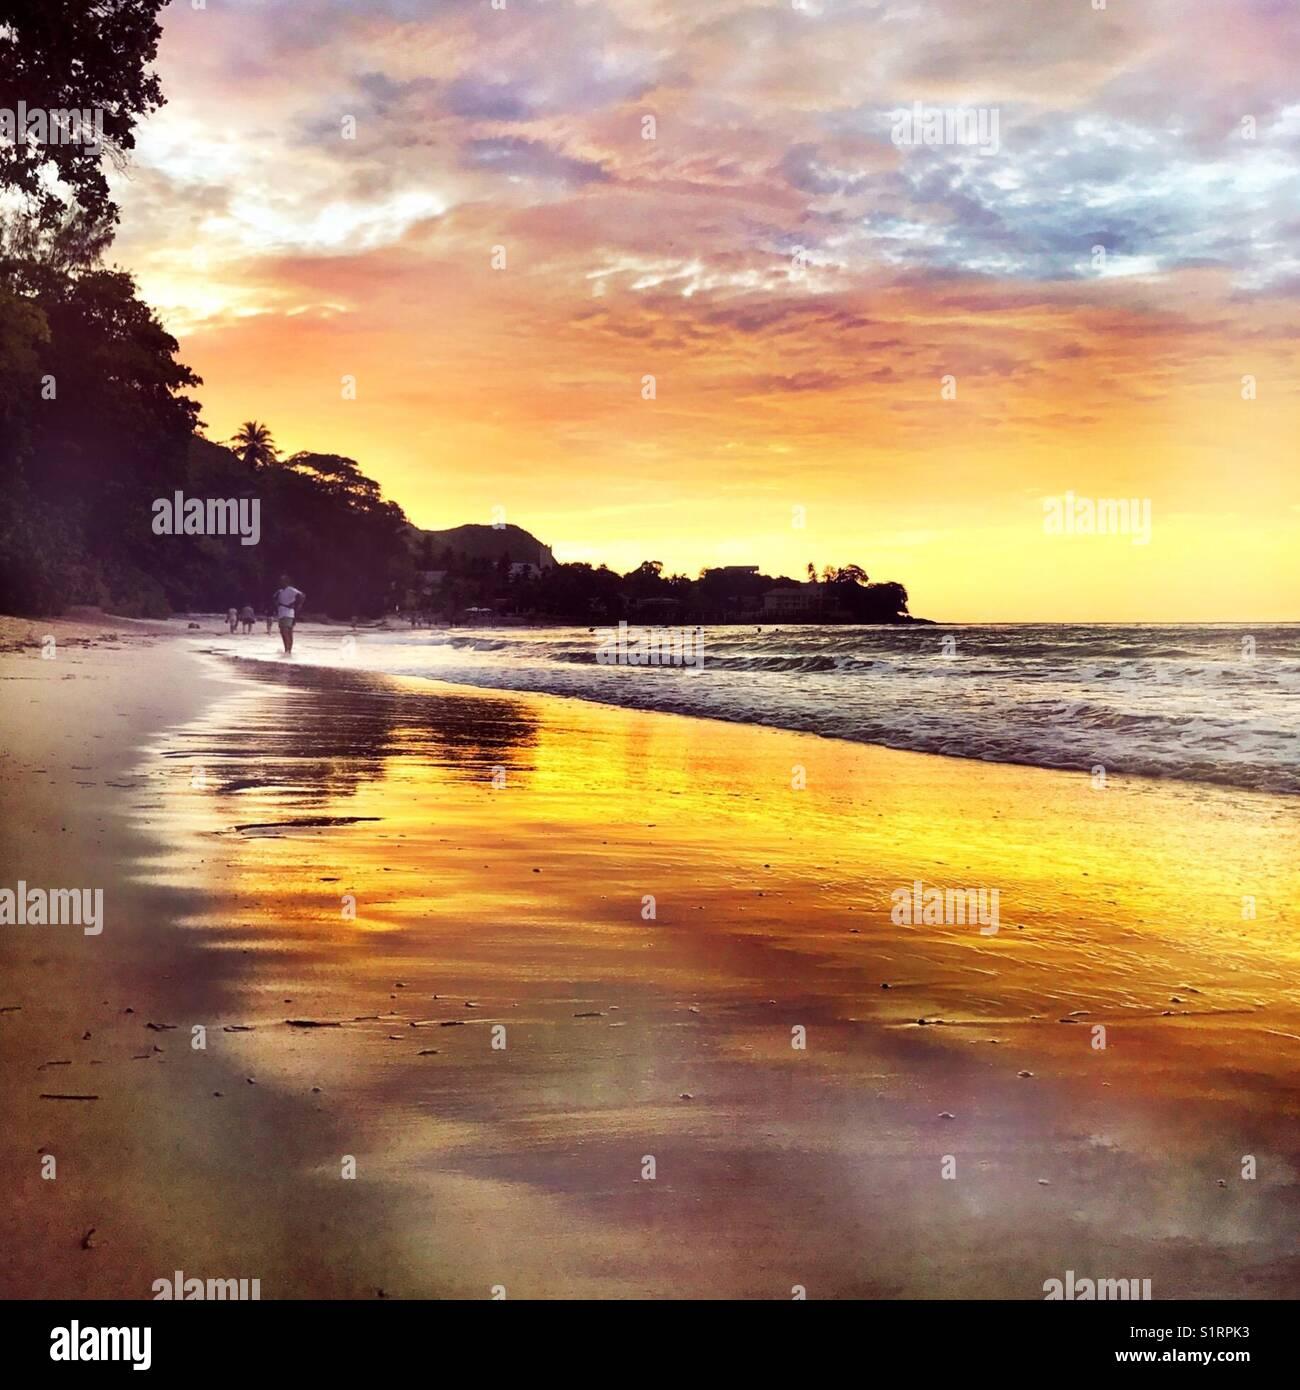 Tropical beach Seychelles - Stock Image